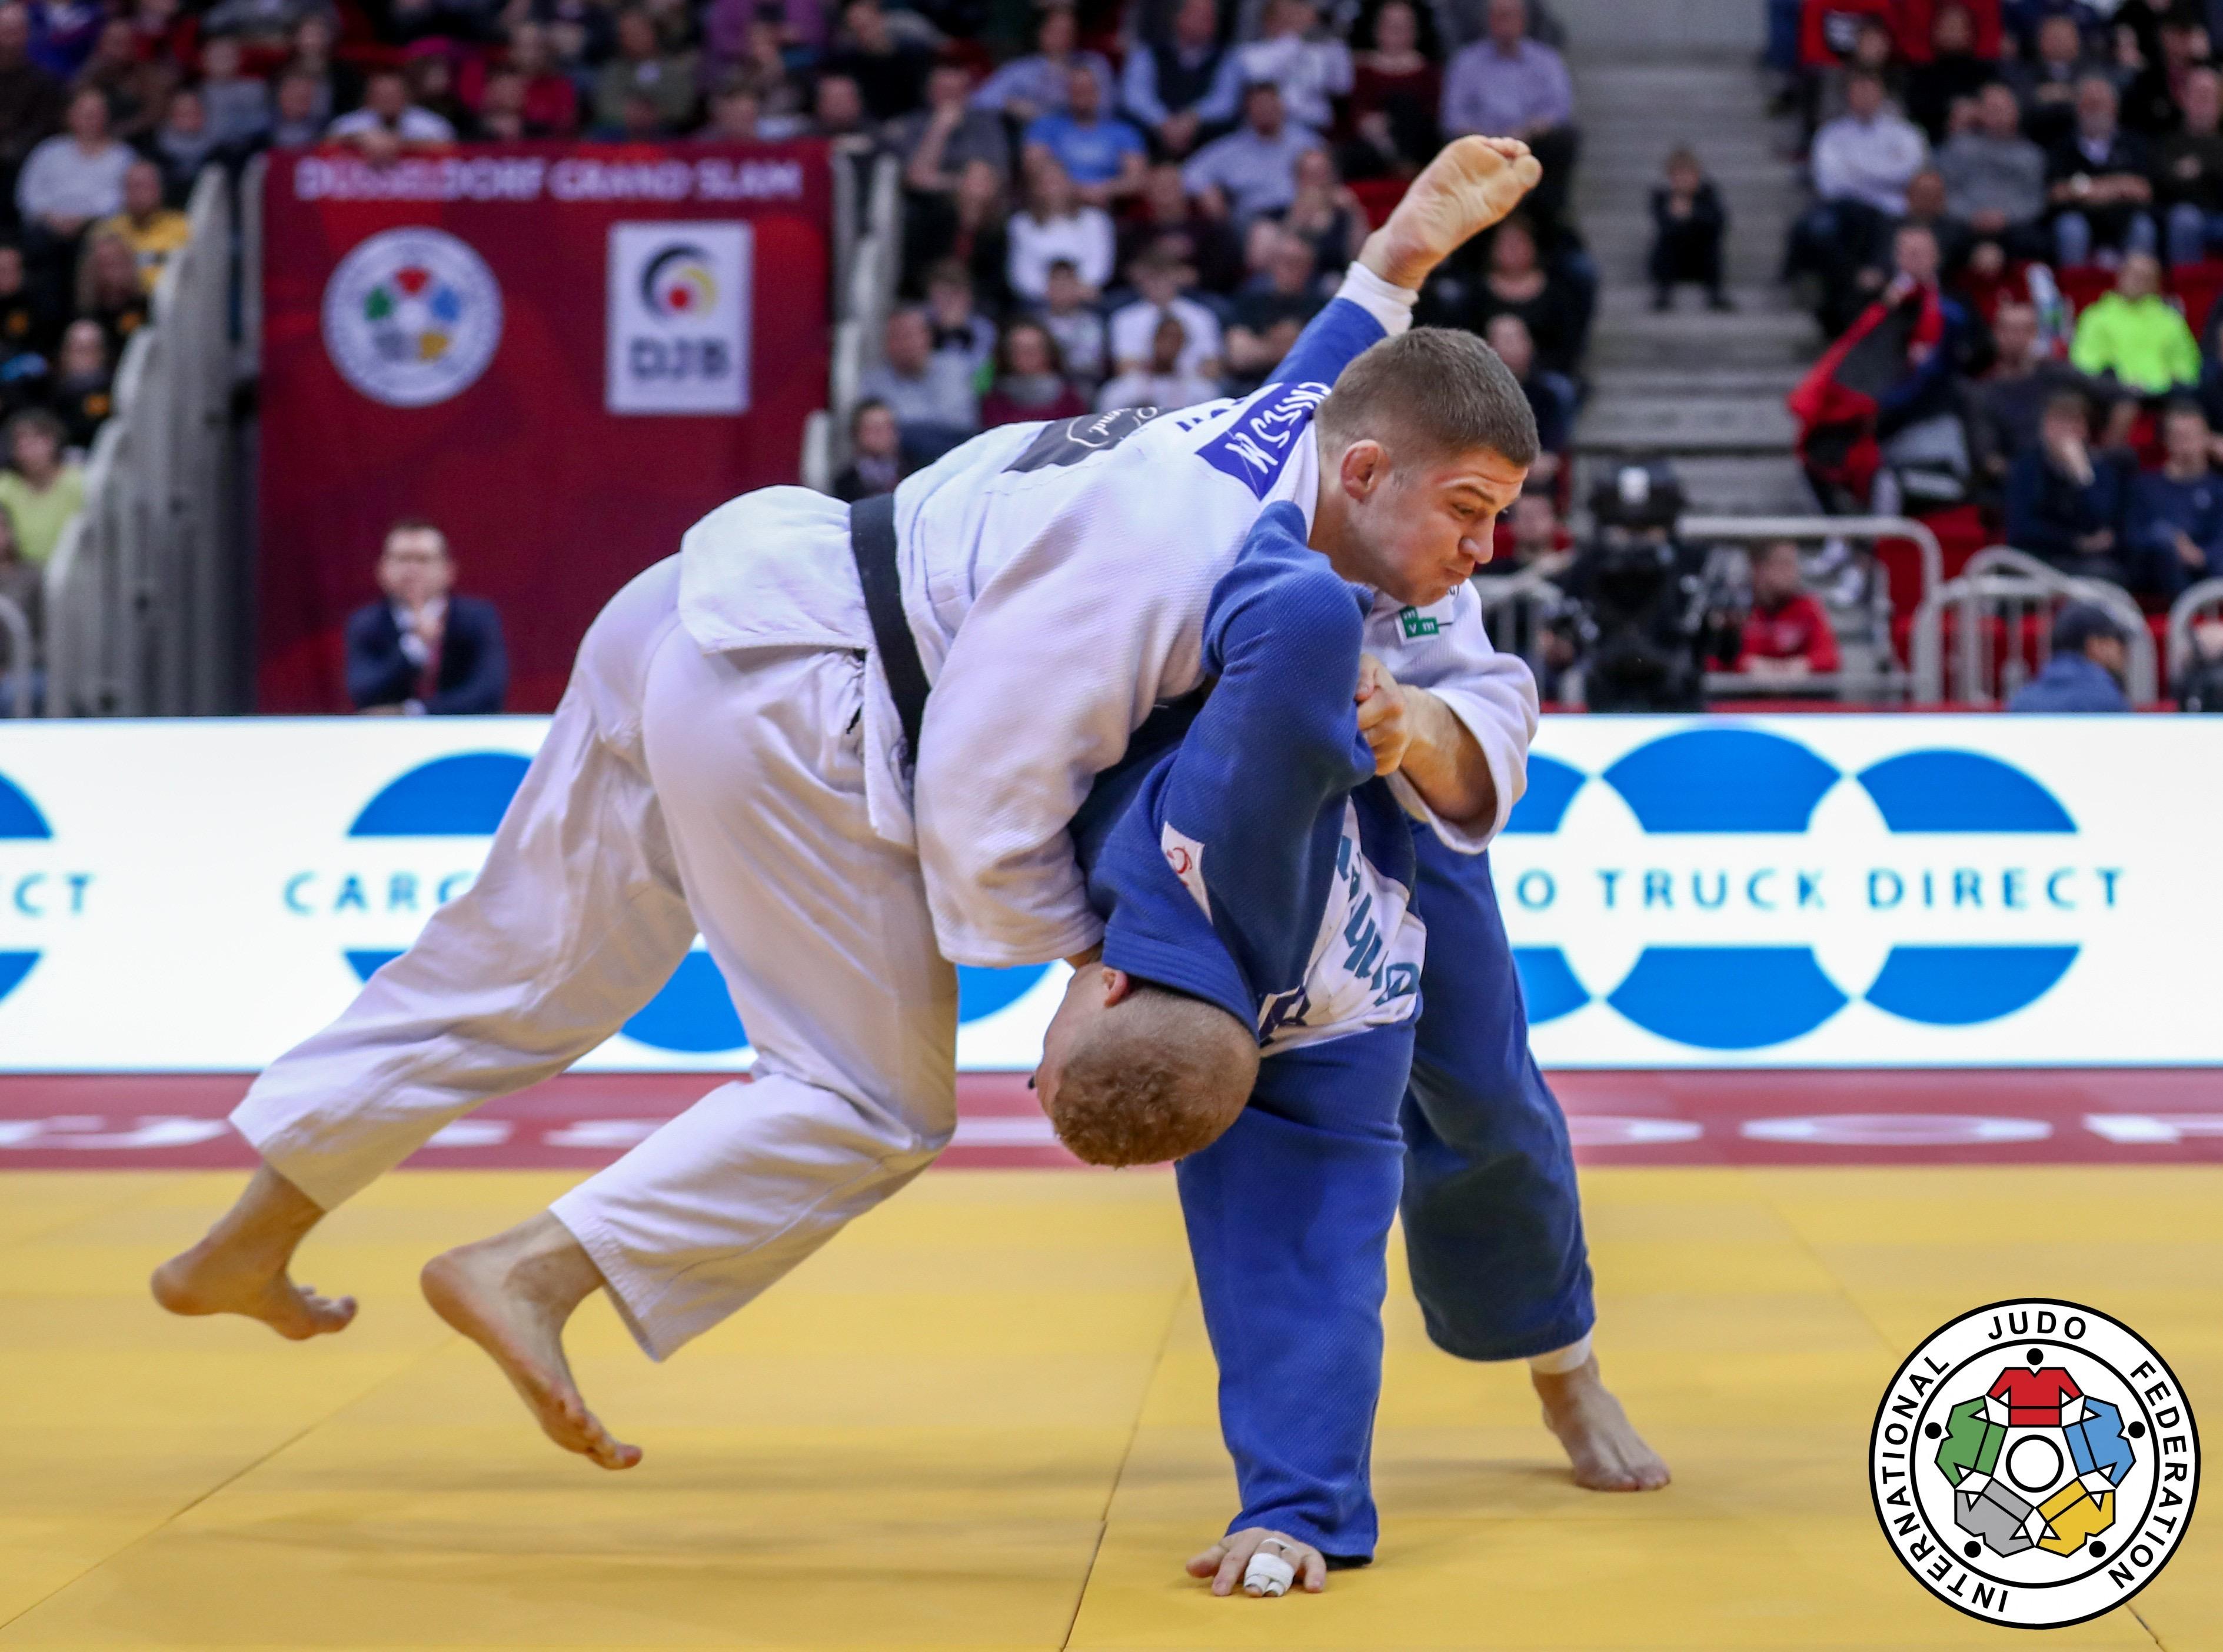 Judo-Grand-Slam-Dusseldorf-2020-CIRJENICS-Miklos